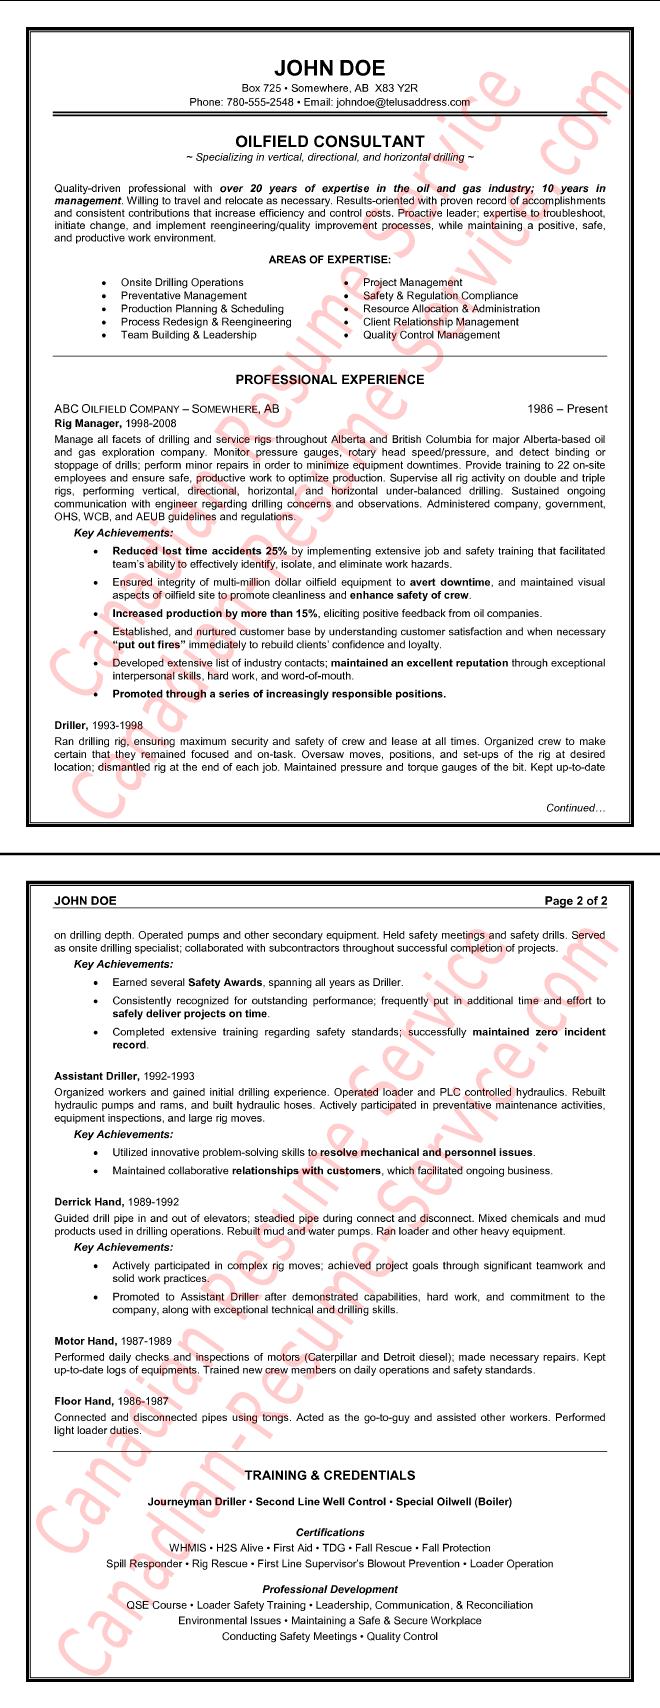 Oilfield Consultant Resume Sample Oilfield, Resume